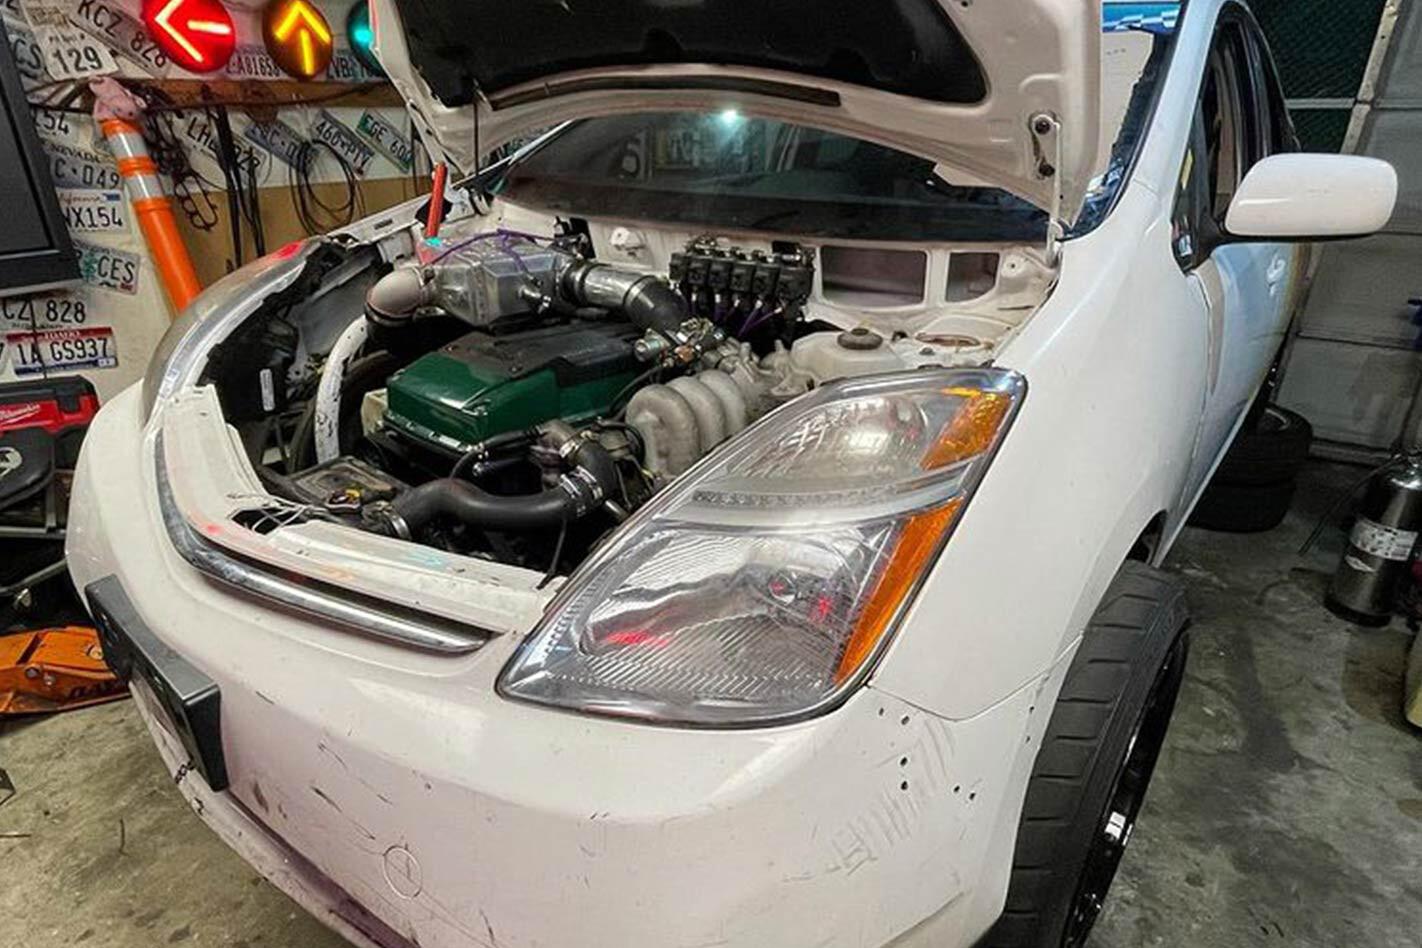 Barra turbo swapped Toyota Prius